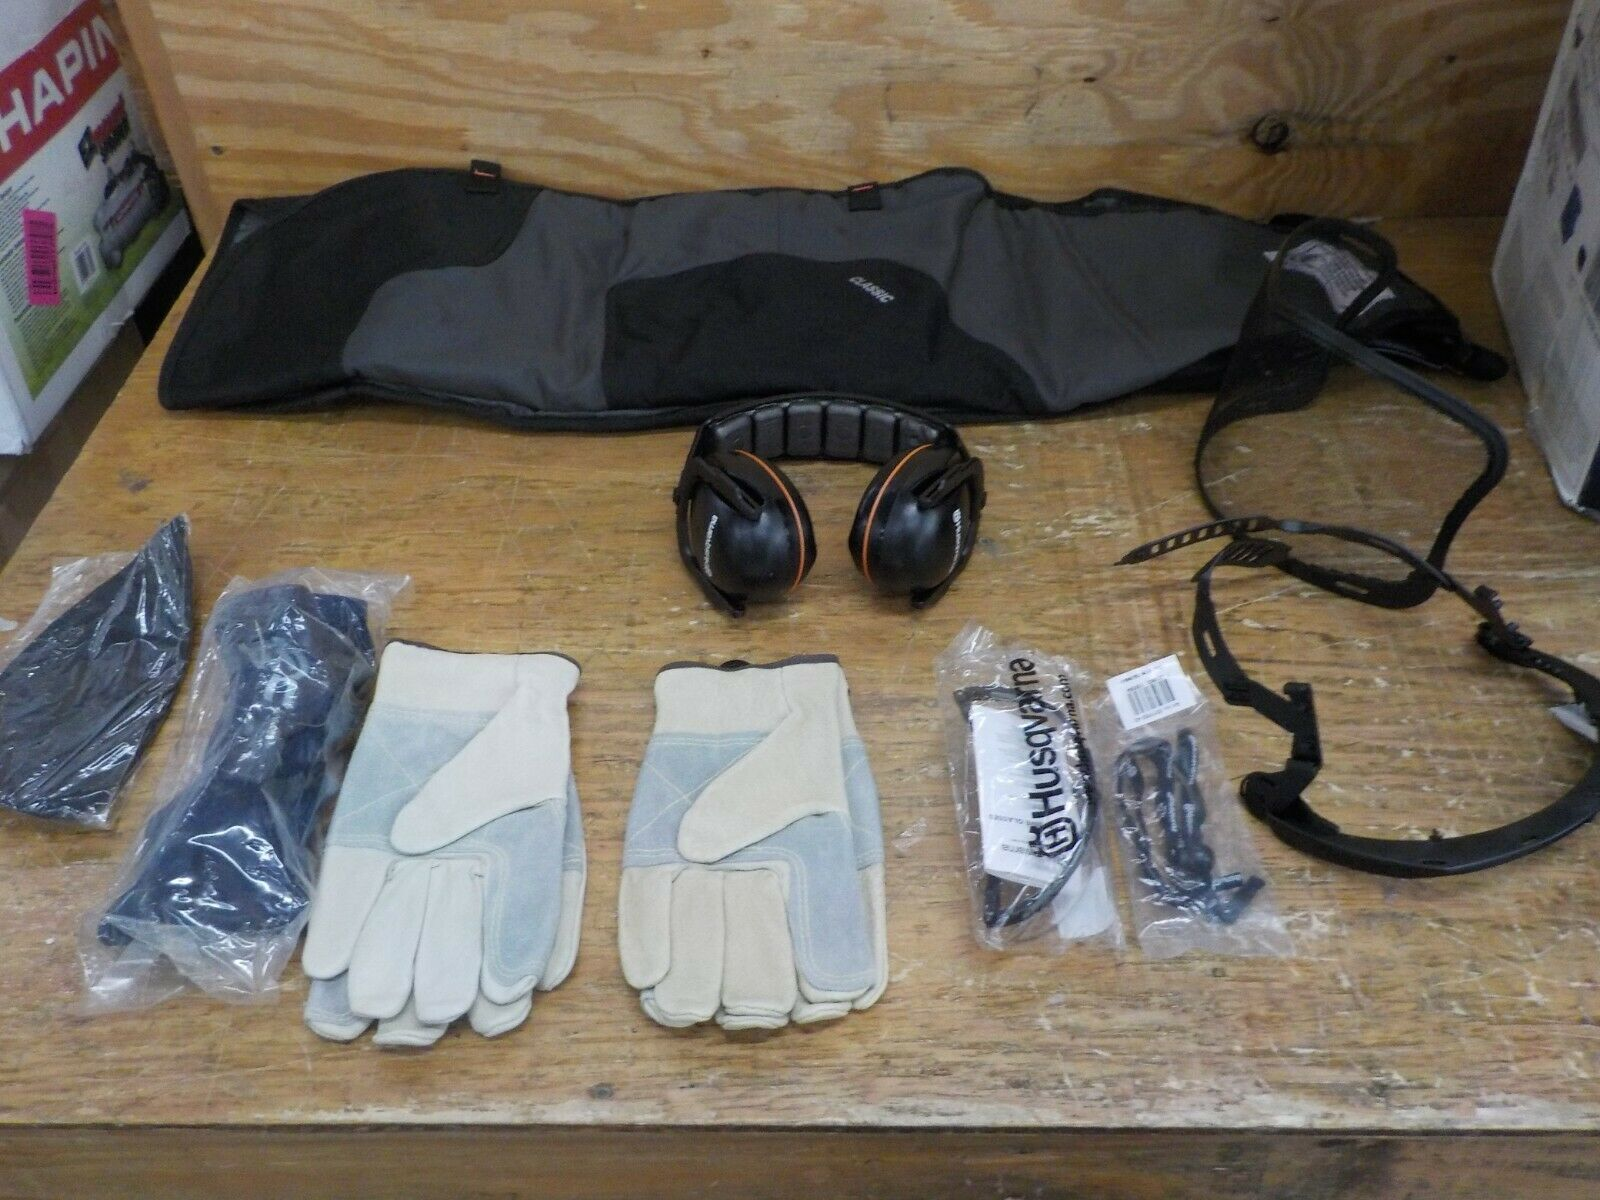 Husqvarna 588100501 Protective Powerkit Accessories